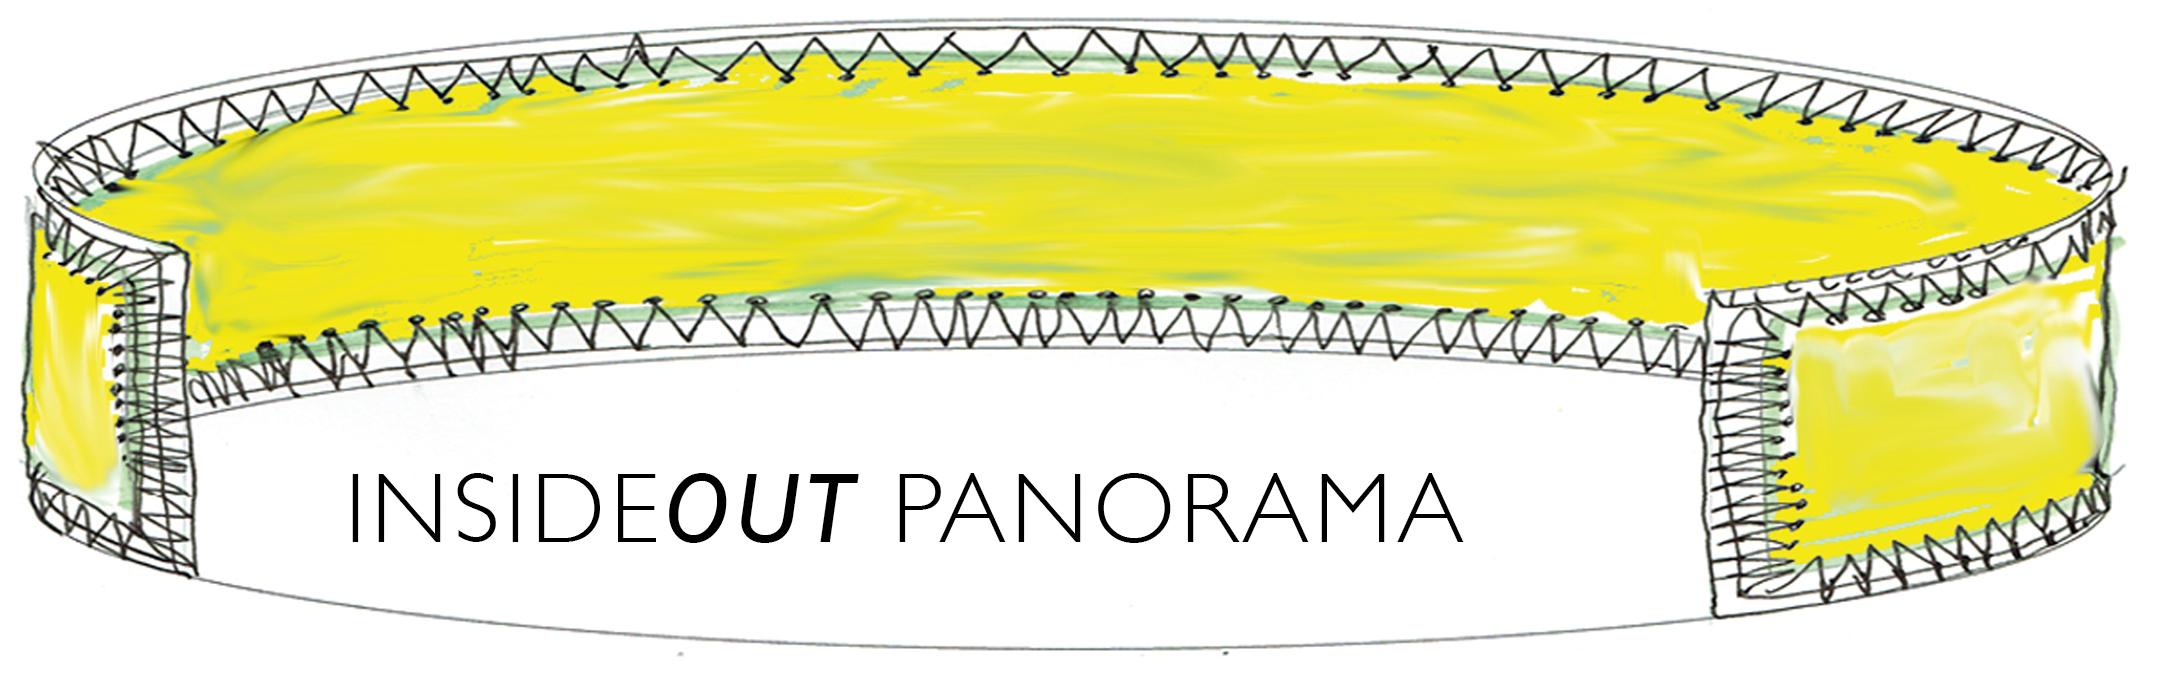 2018 InsideOut Panorama